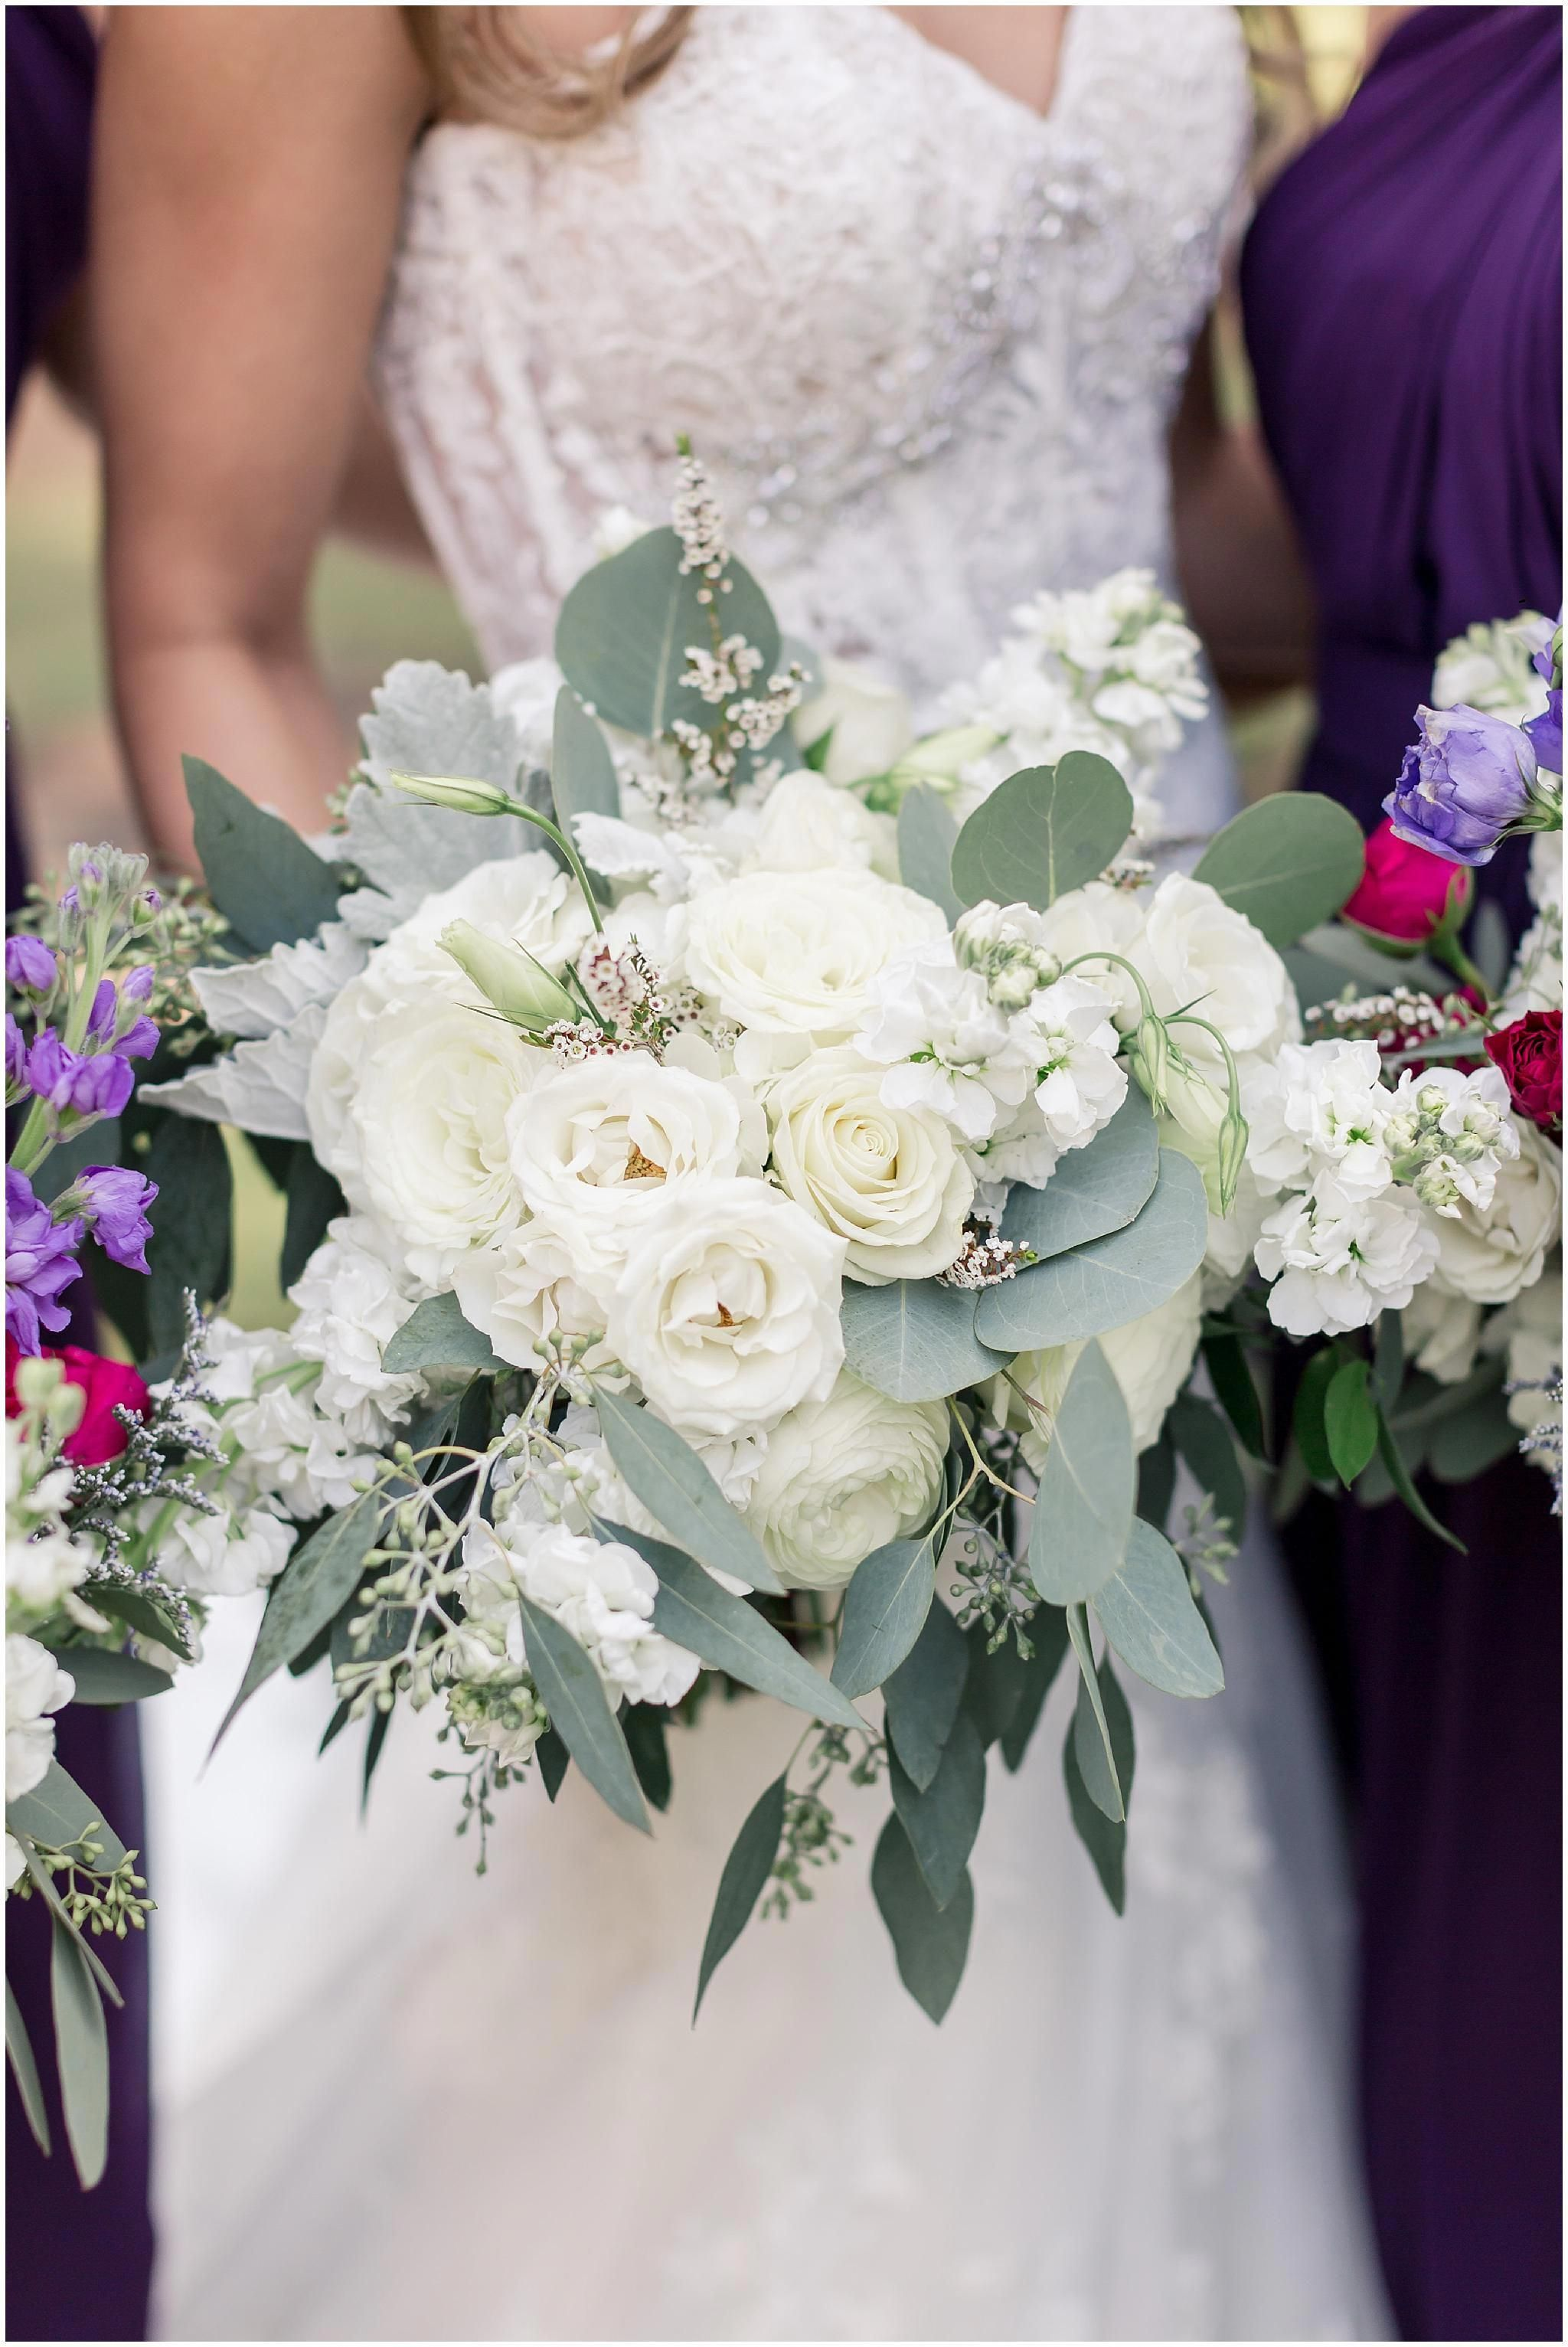 White Wedding Bouquet Eucalyptus Greenery Roses Ranunculus Baby Breath Seeded Eucalyp White Wedding Bouquets White Roses Wedding Babys Breath Bouquet Wedding